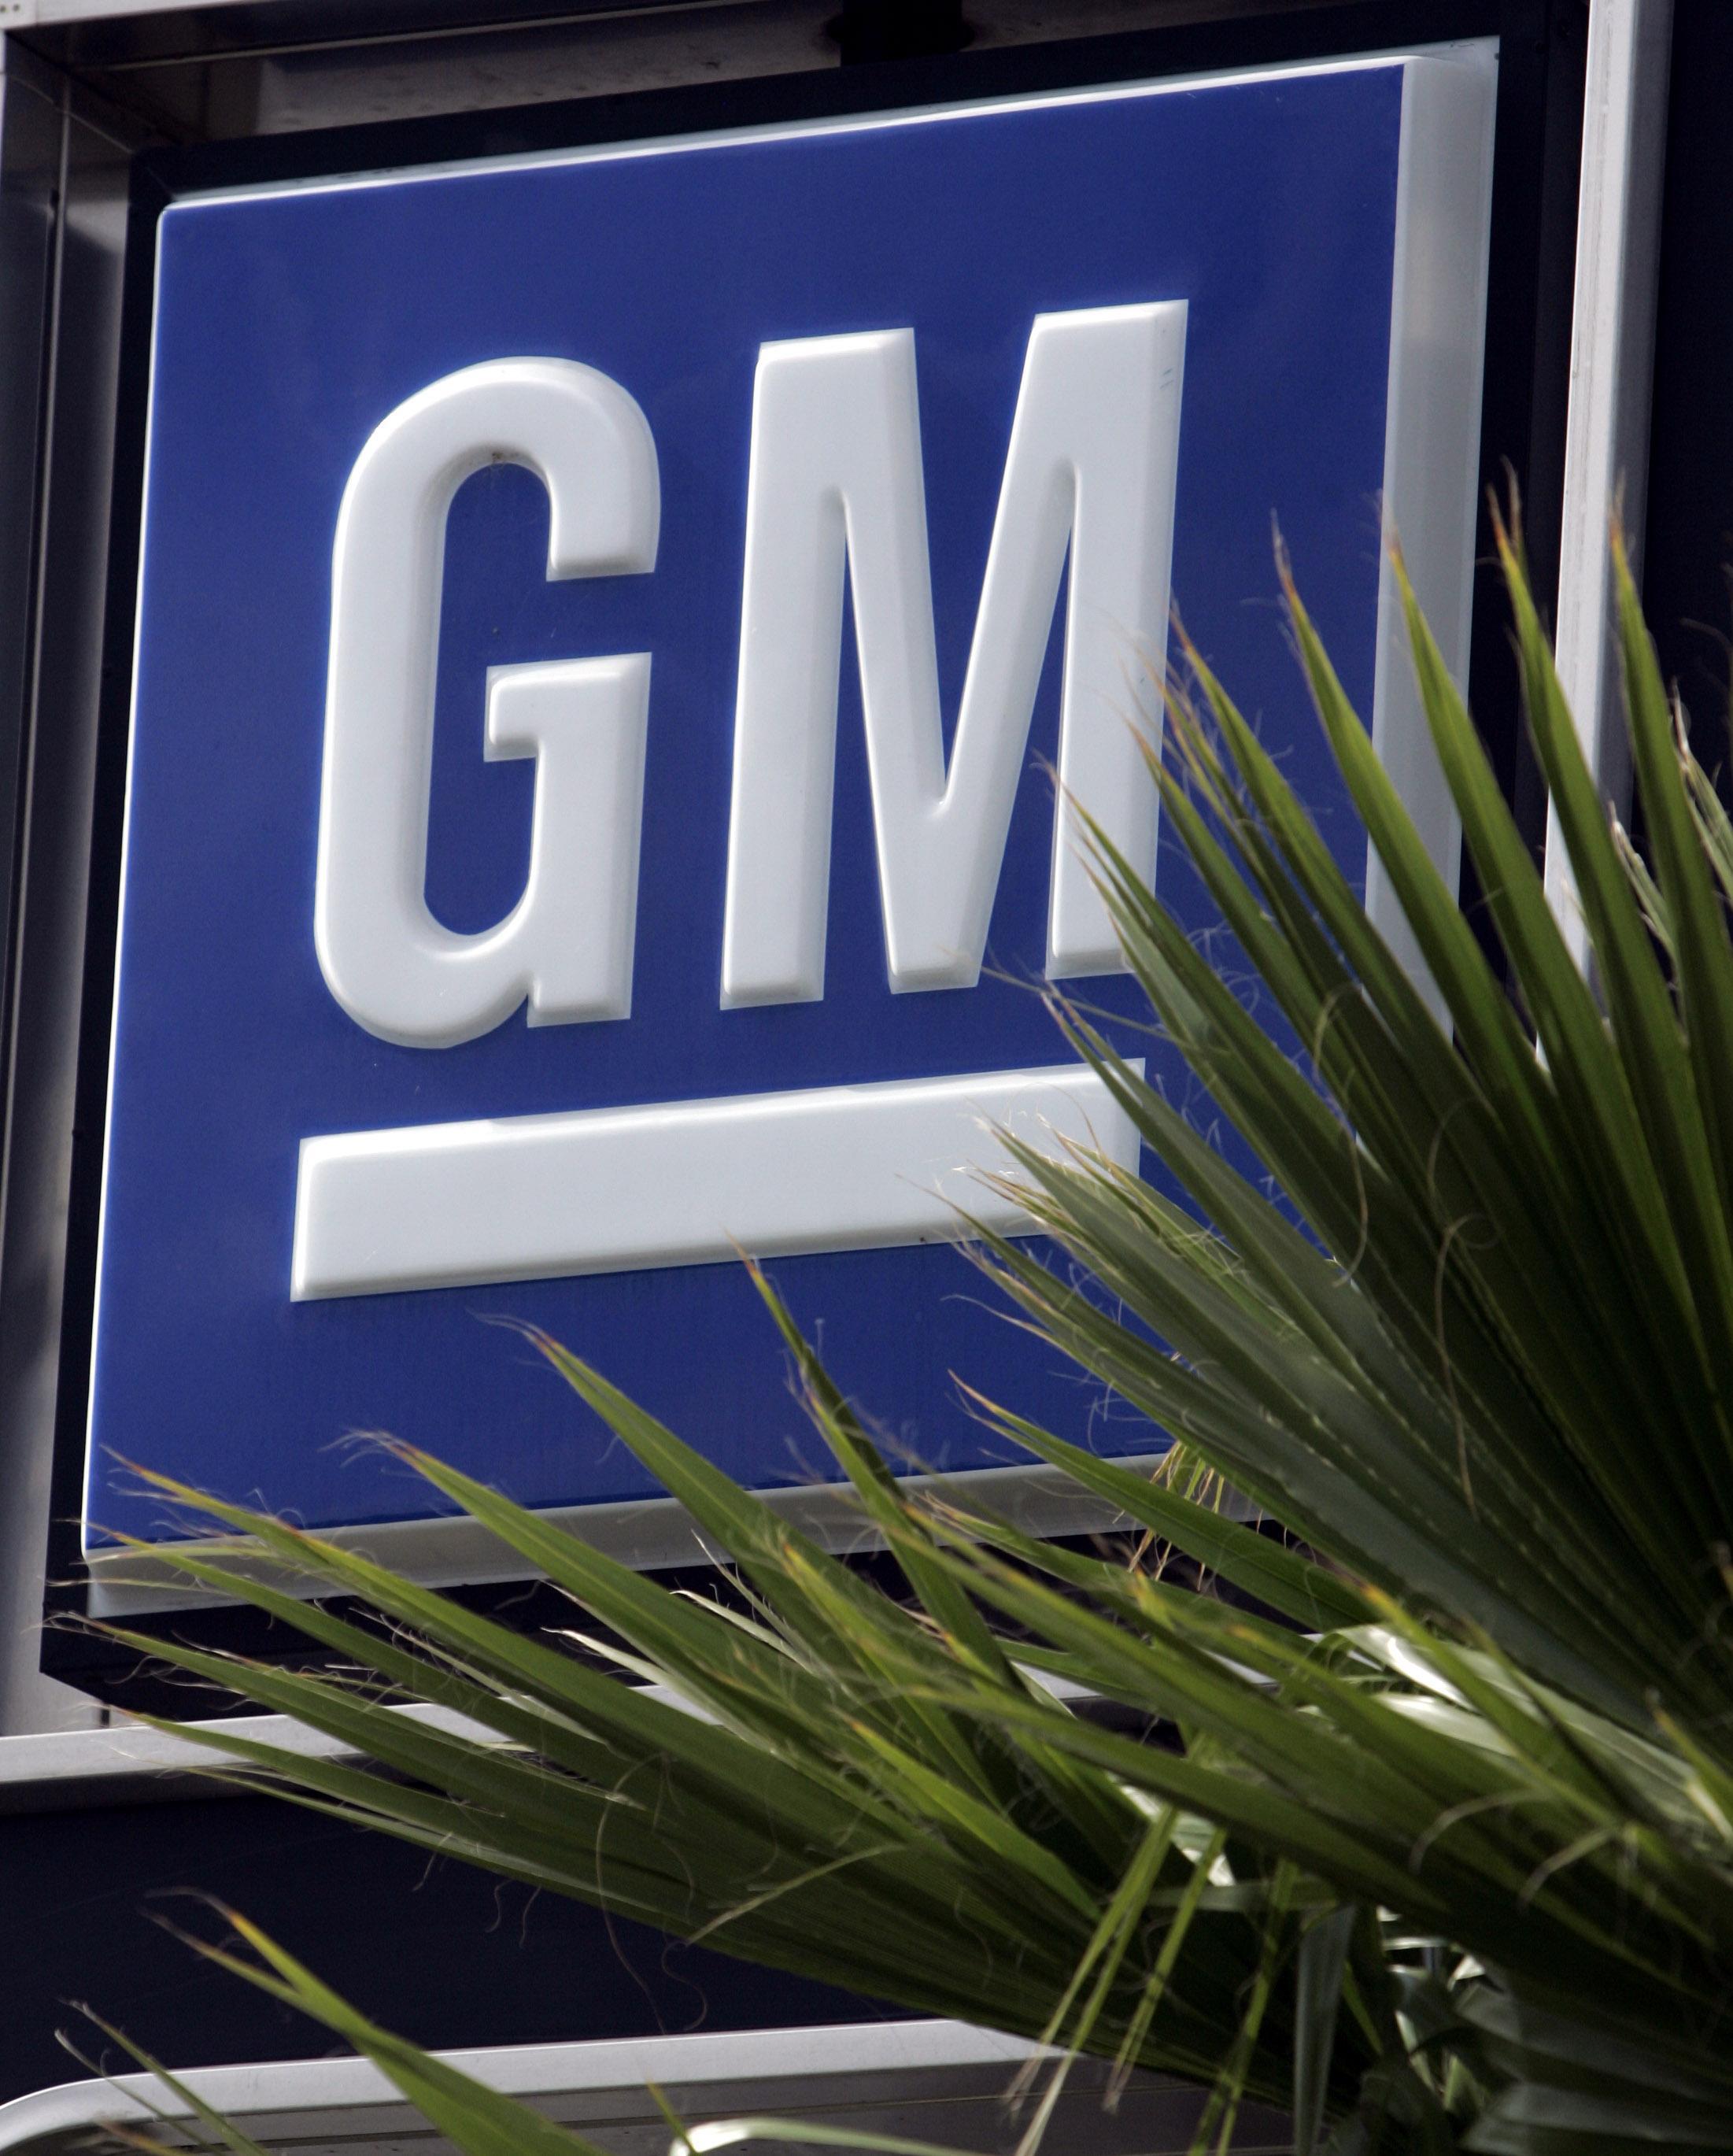 General Motors Has Bought Strobe Inc Of Pasadena California For A Small